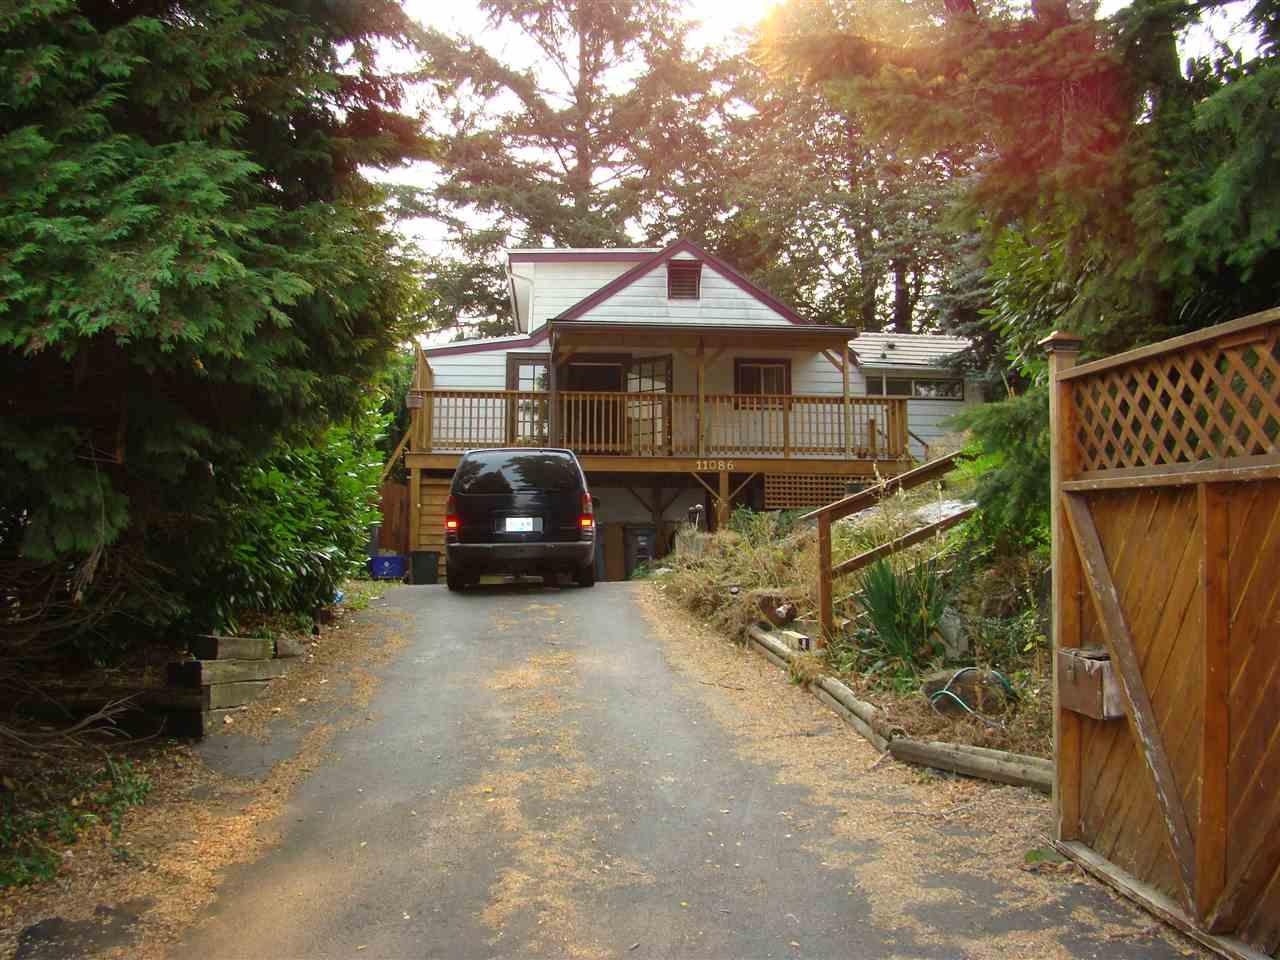 Detached at 11086 129 STREET, North Surrey, British Columbia. Image 1